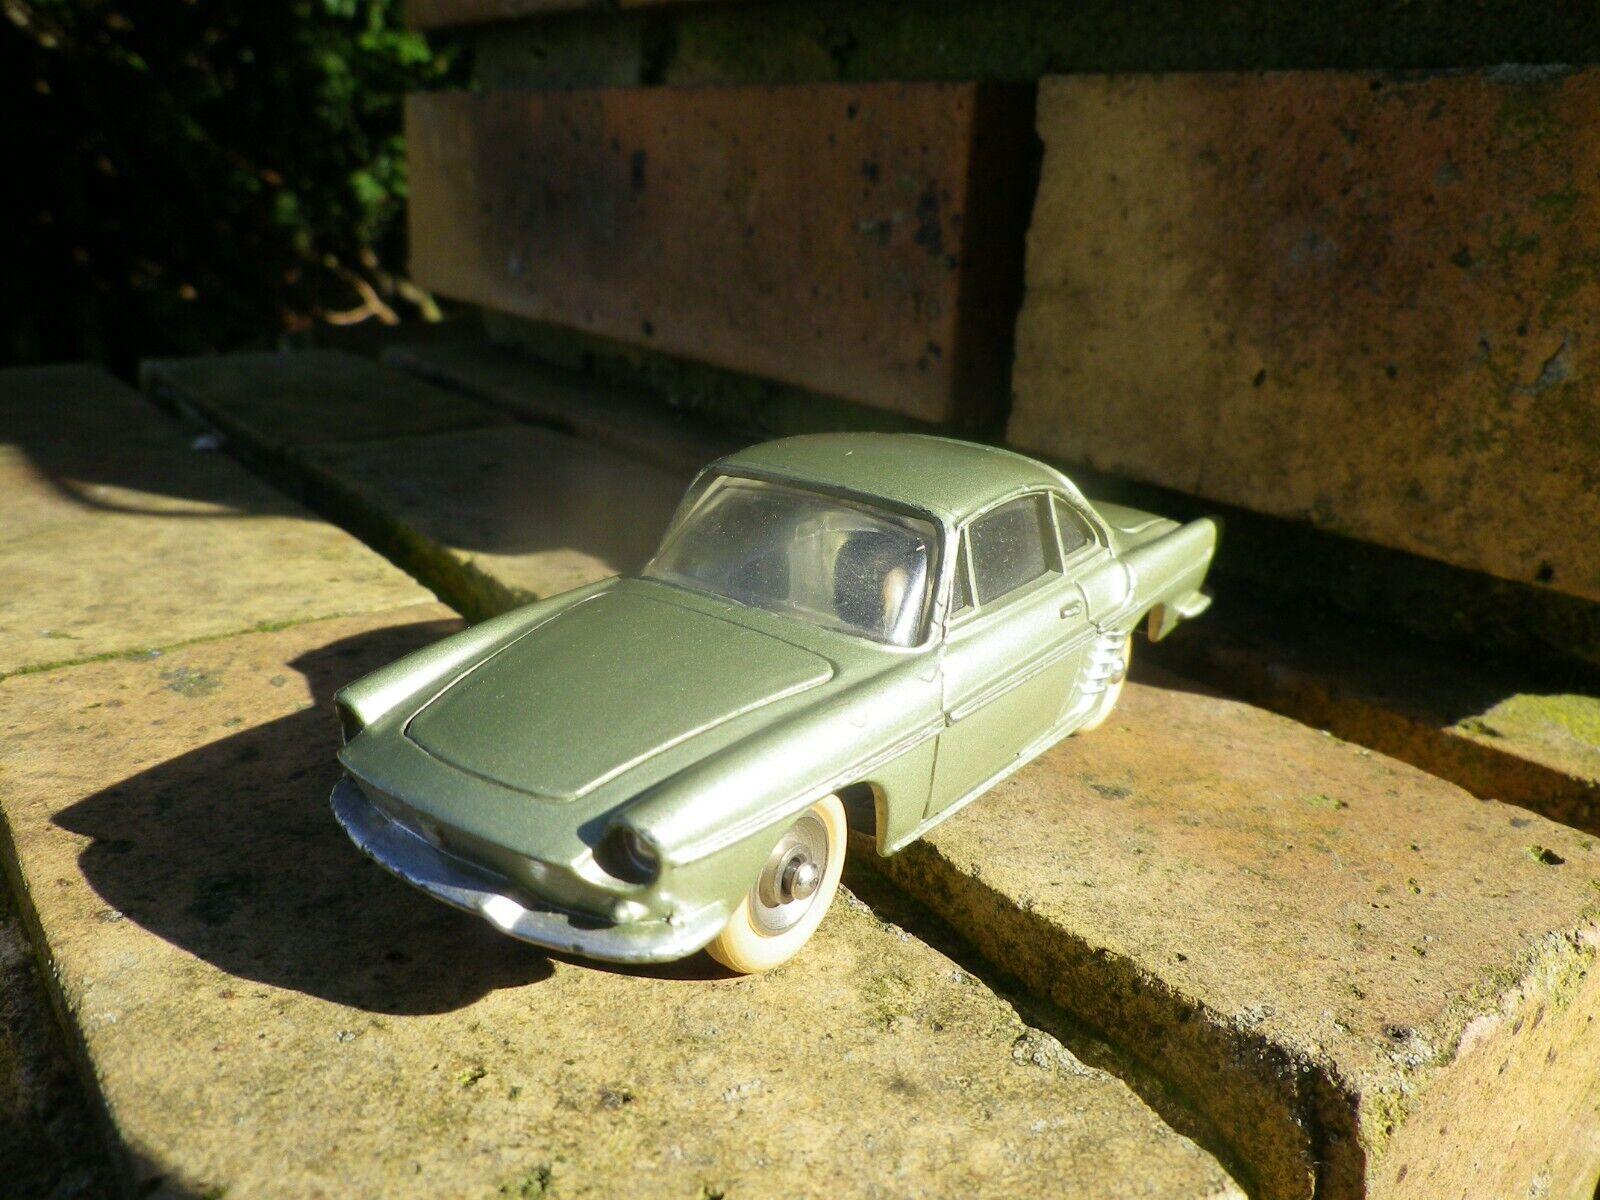 DINKY TOYS 543 RENAULT FLORIDE verdee made in FRANCE 1958 TRES BON ETAT